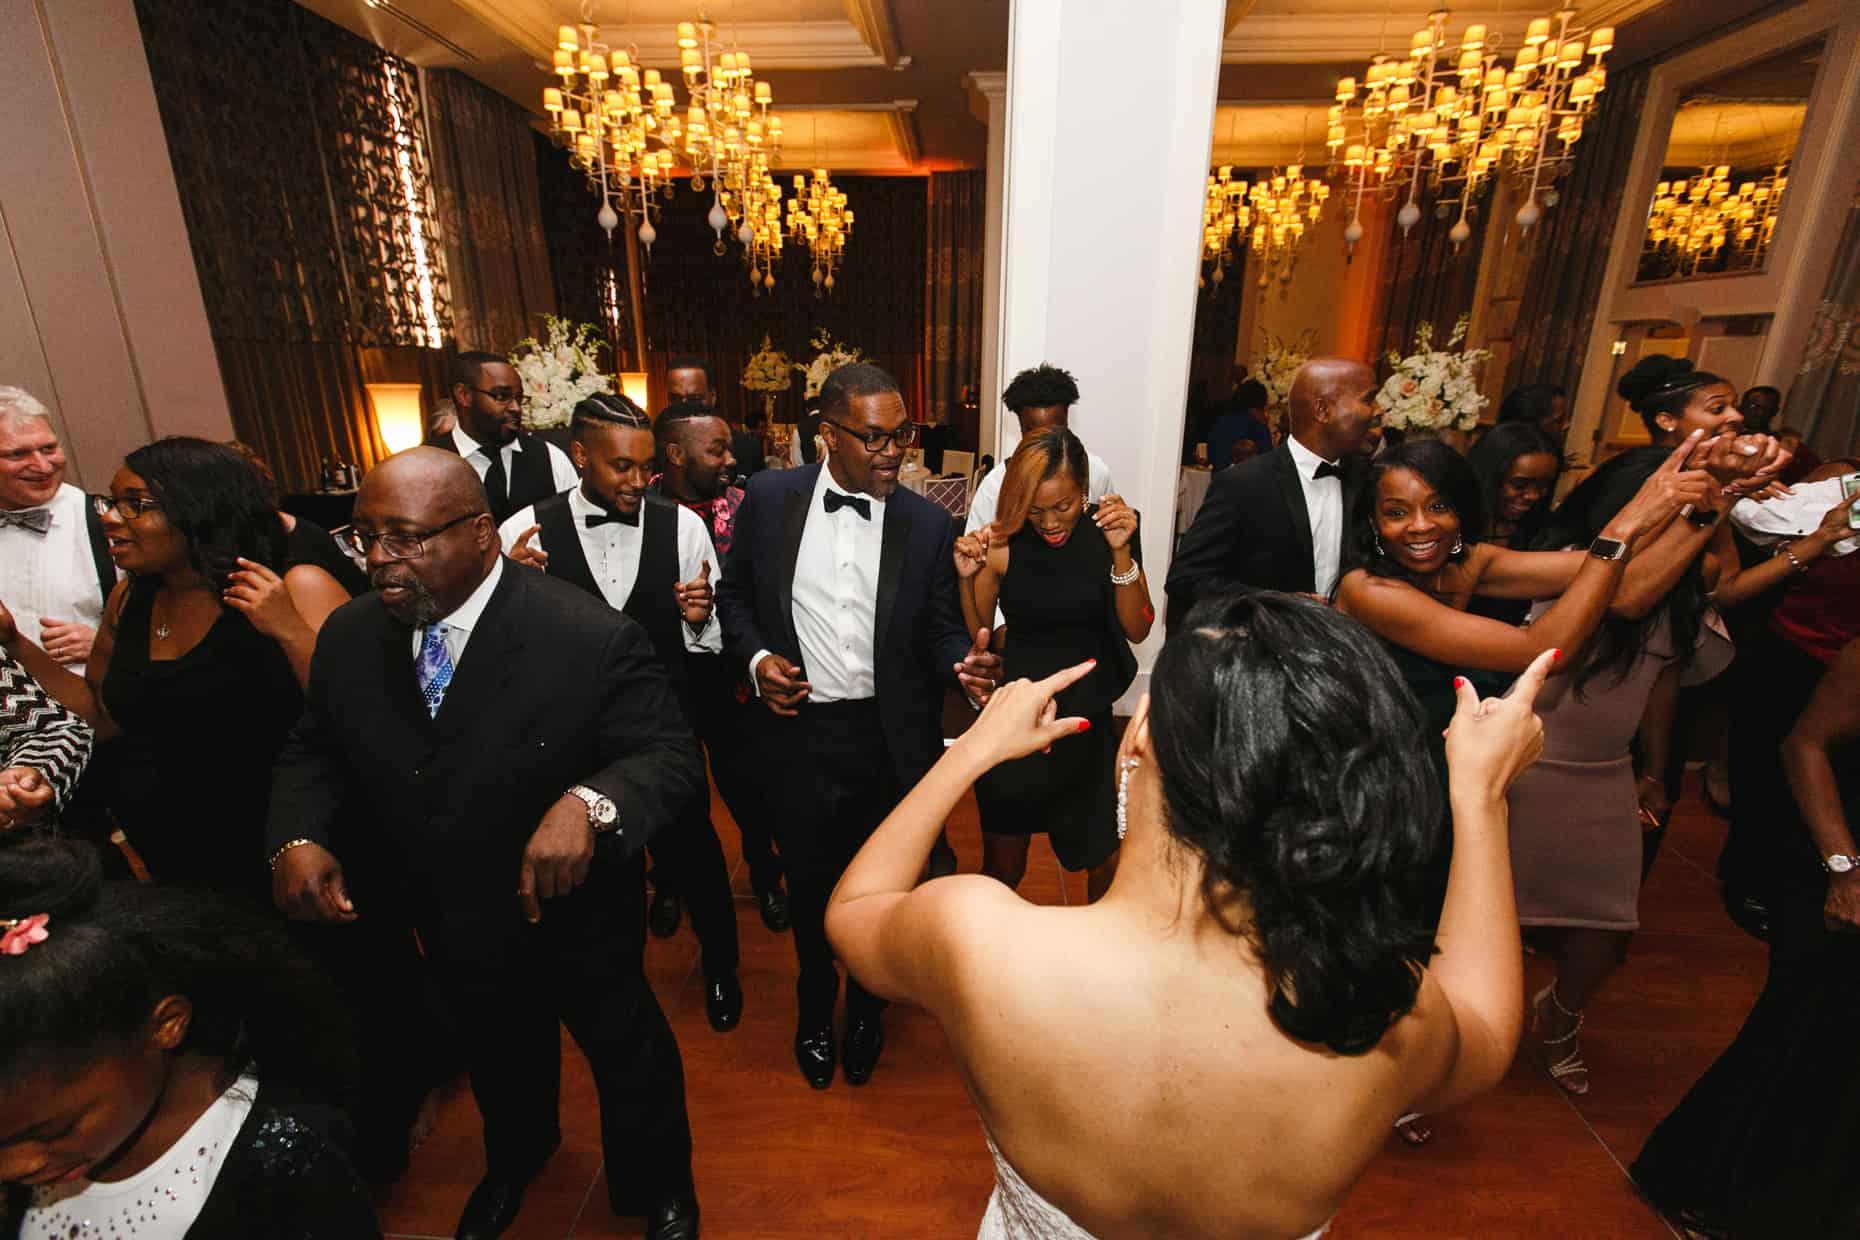 Wedding Photographers Lafayette South Ballroom